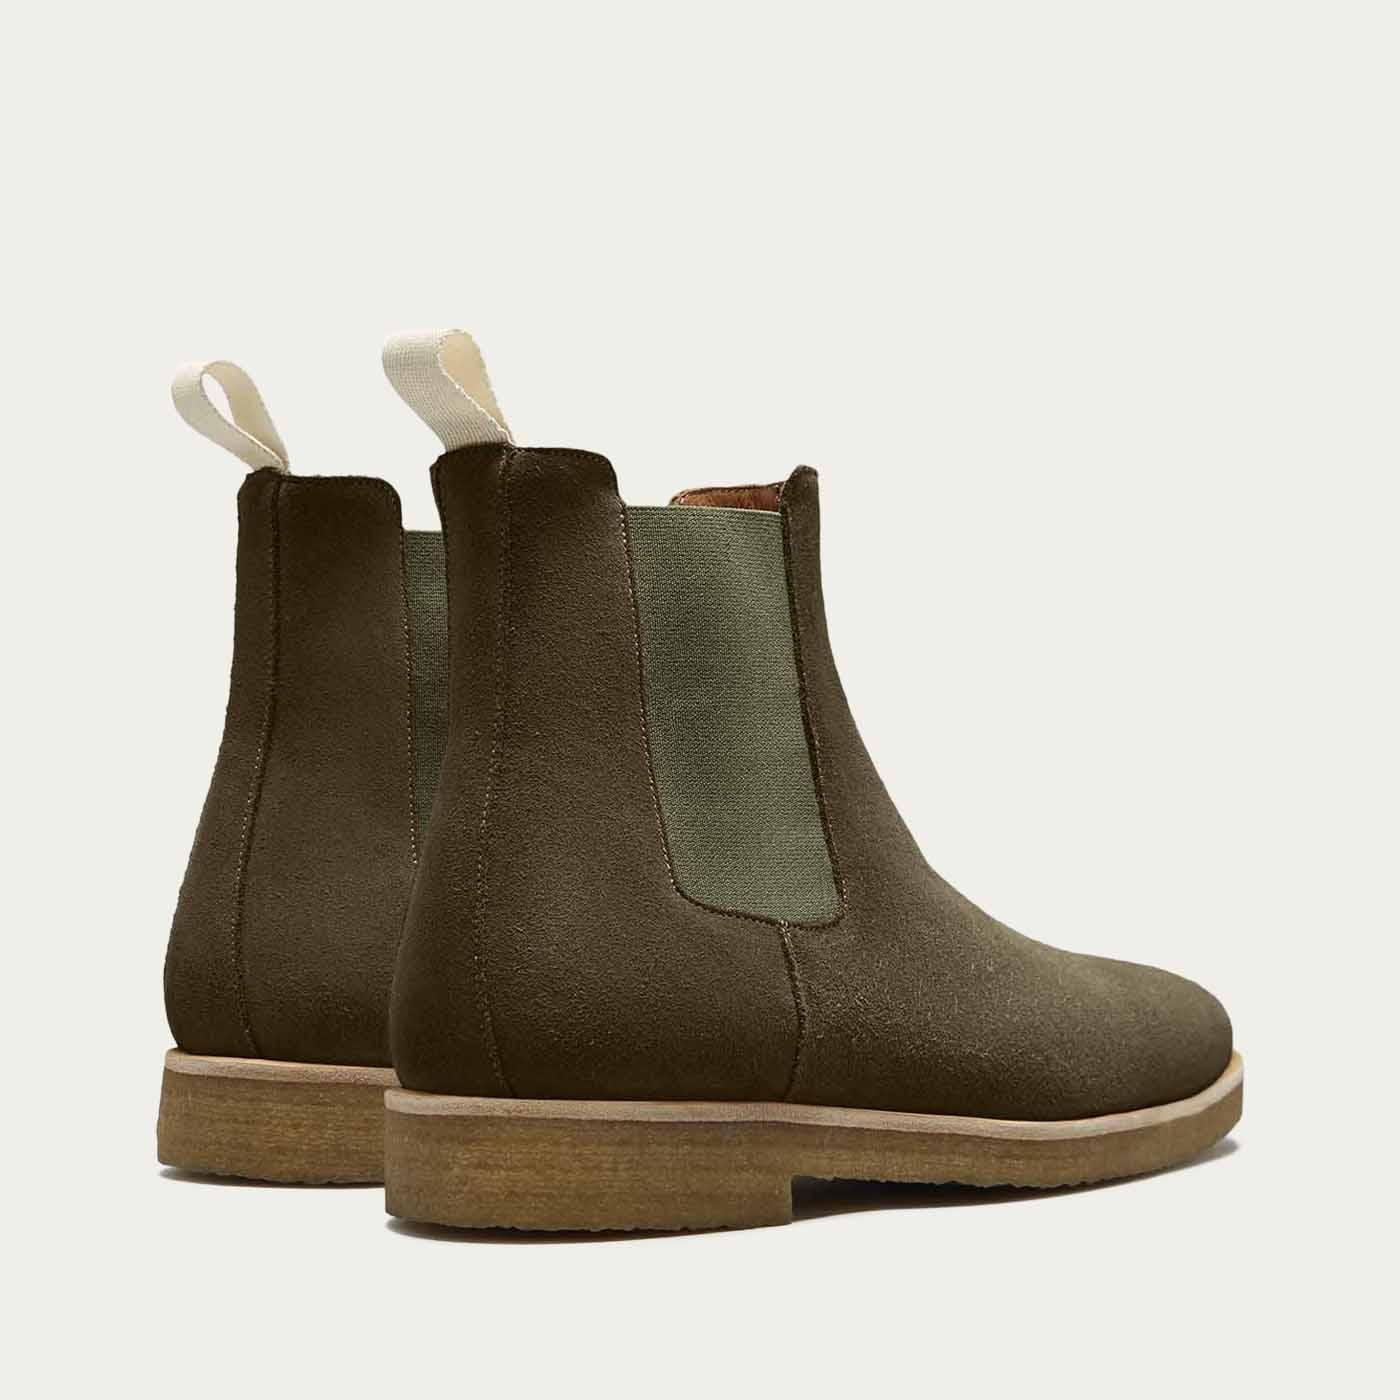 Truffle Chelsea Boots 1